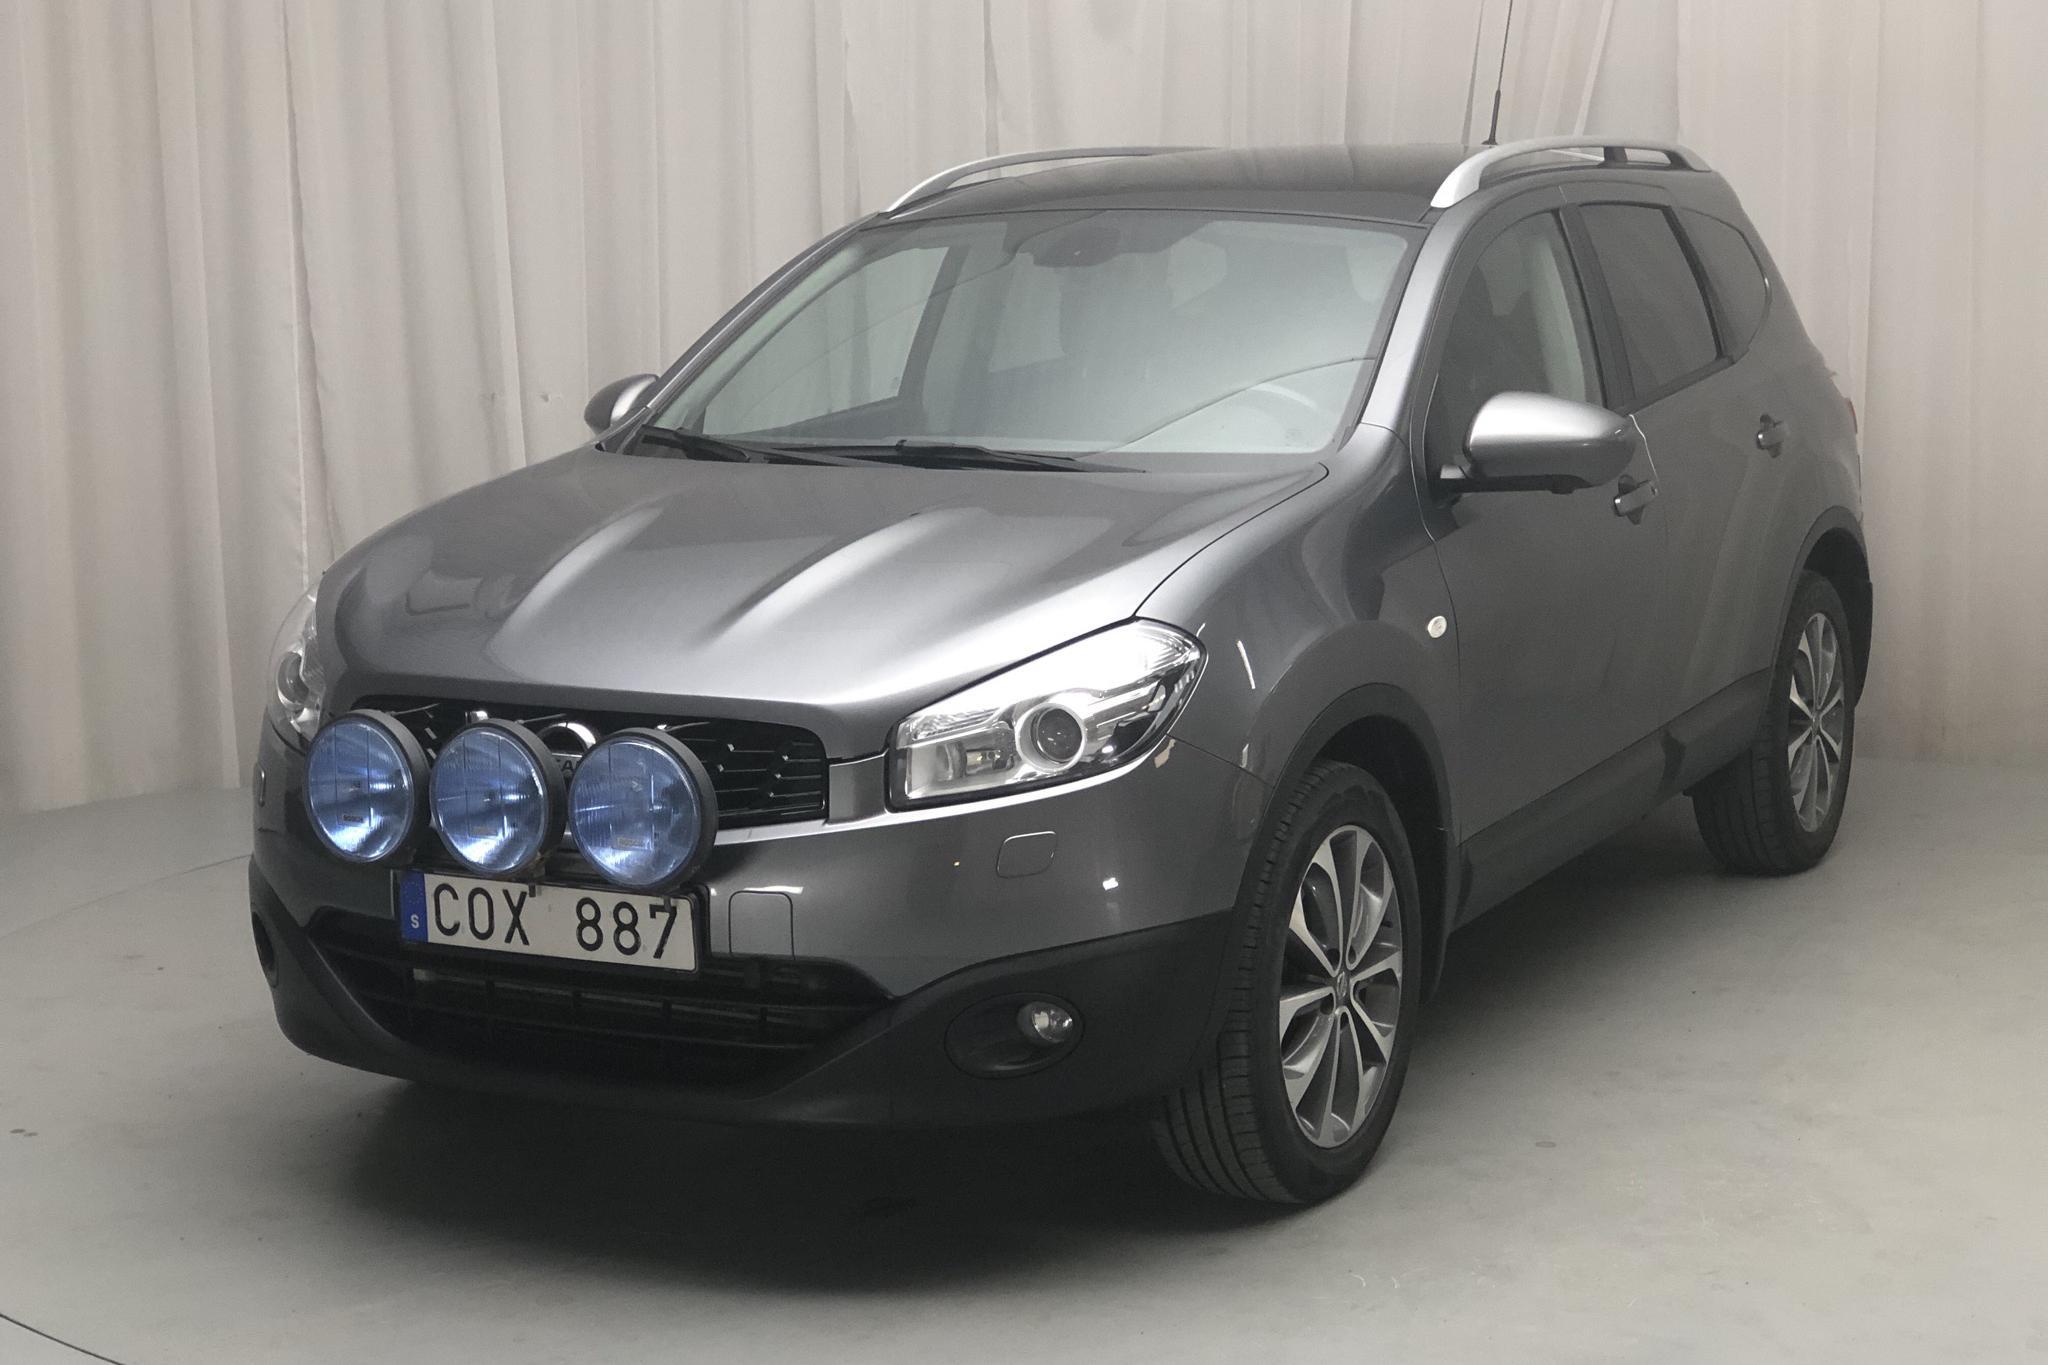 Nissan Qashqai+2 2.0 dCi 4x4 (150hk) - 202 400 km - Automatic - gray - 2012